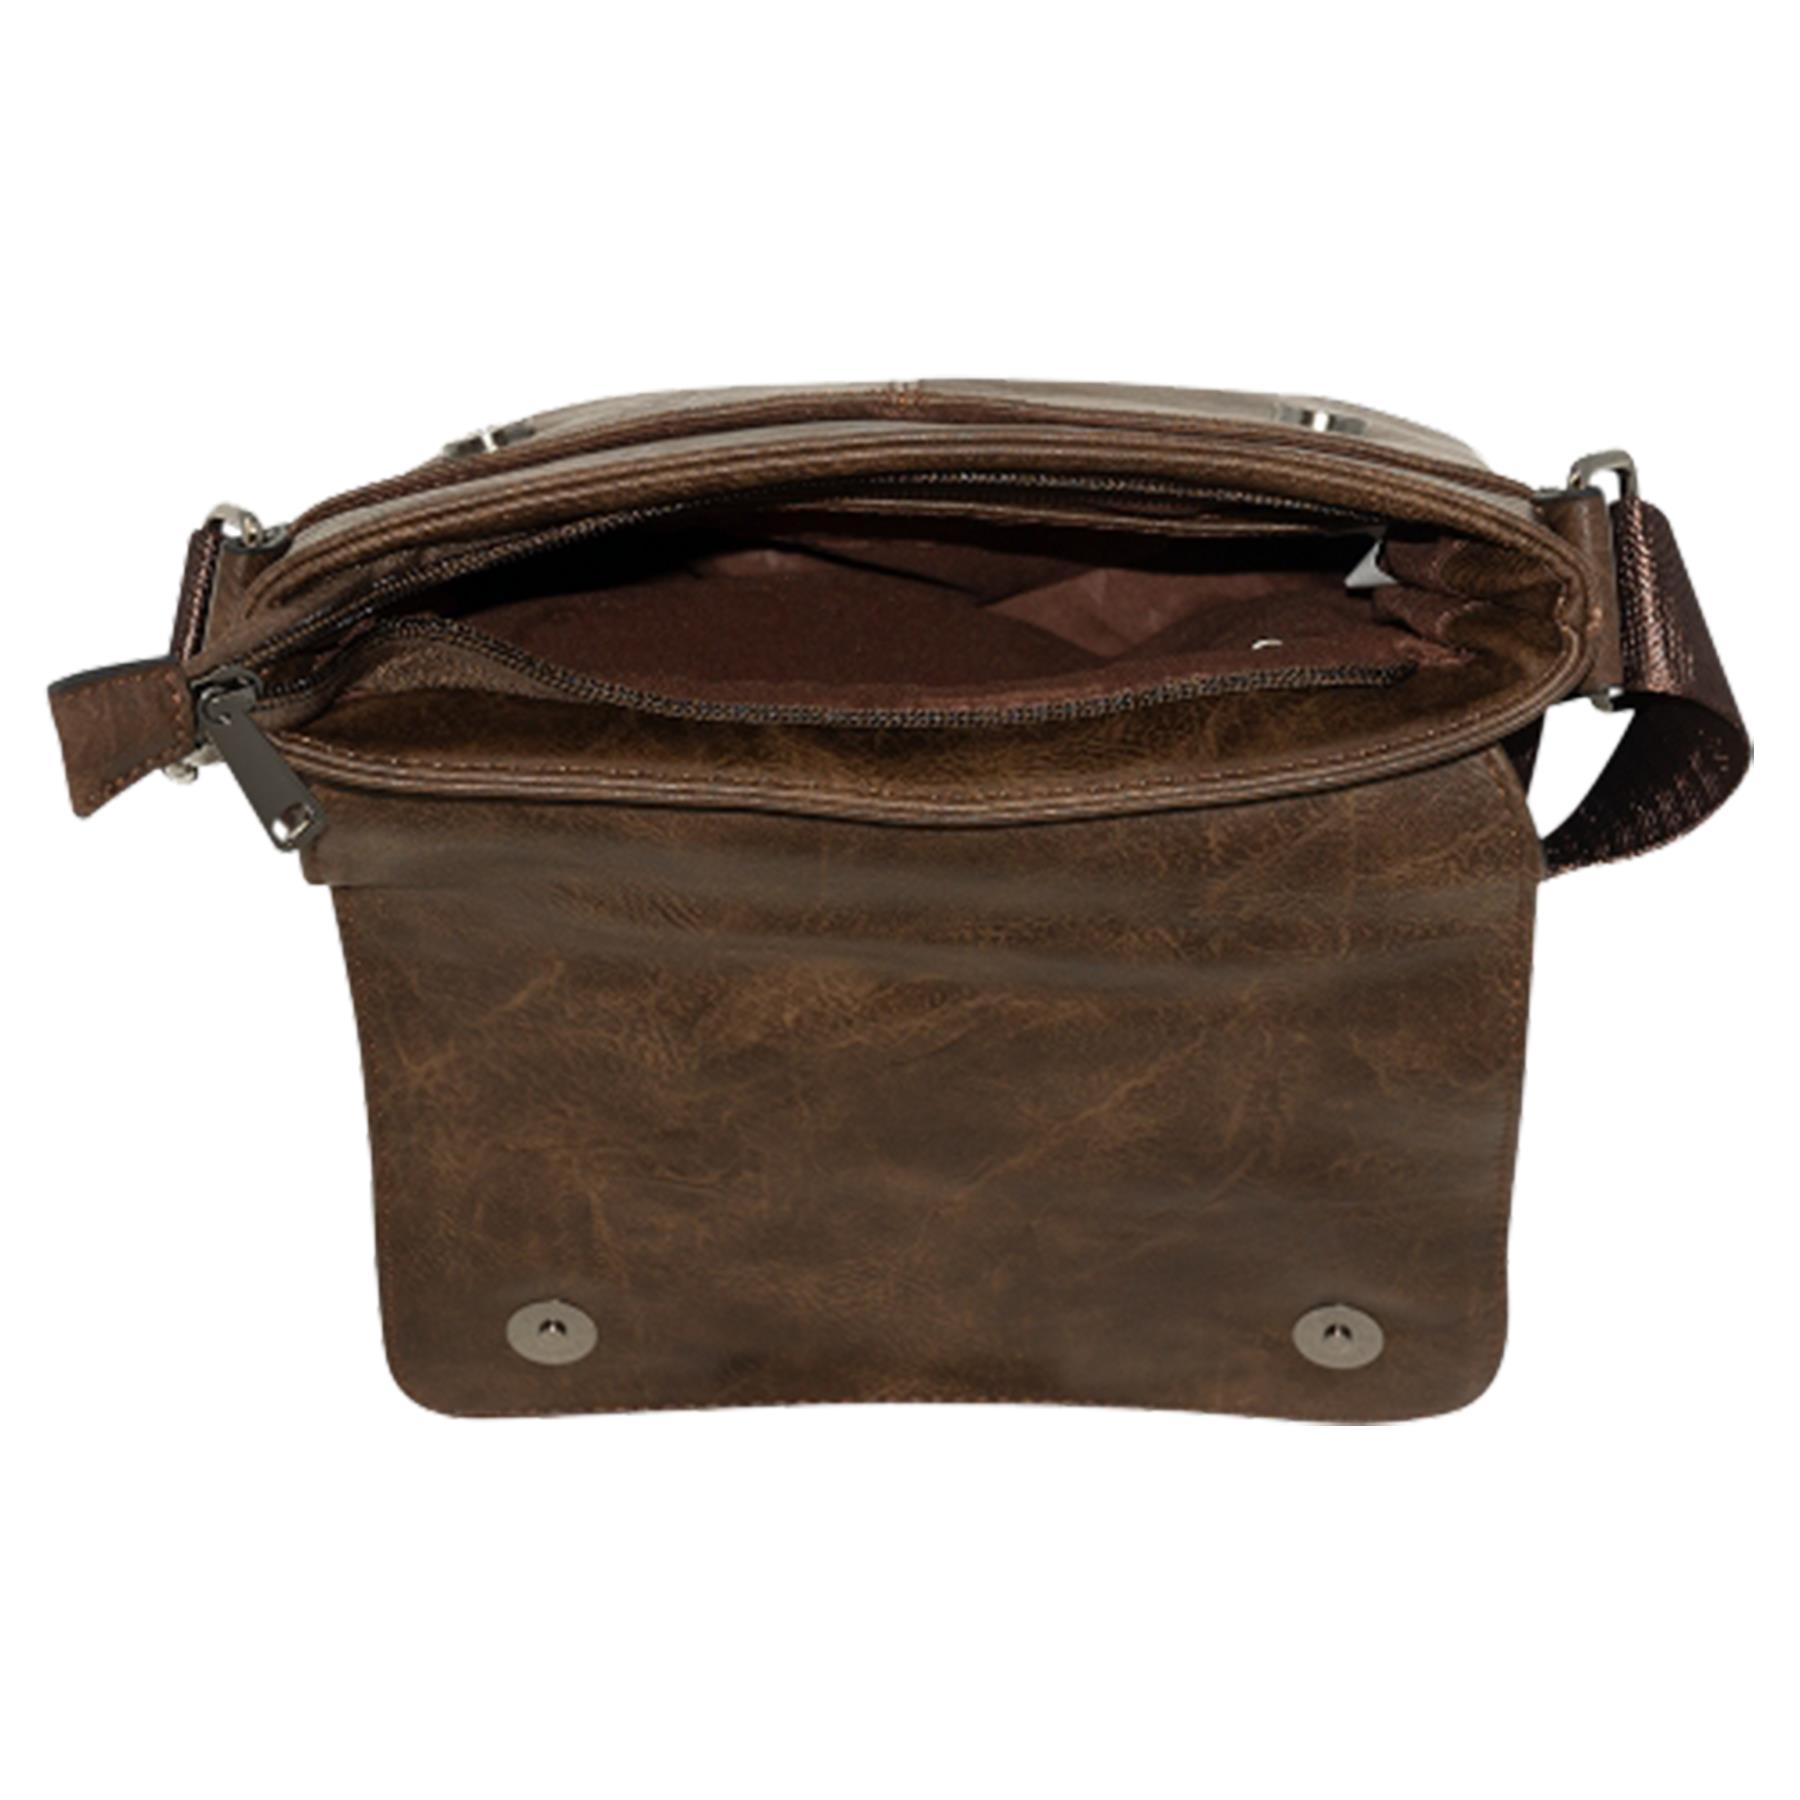 New-Plain-Faux-Leather-Men-s-Travel-Casual-Flap-Over-Messenger-Bag thumbnail 13